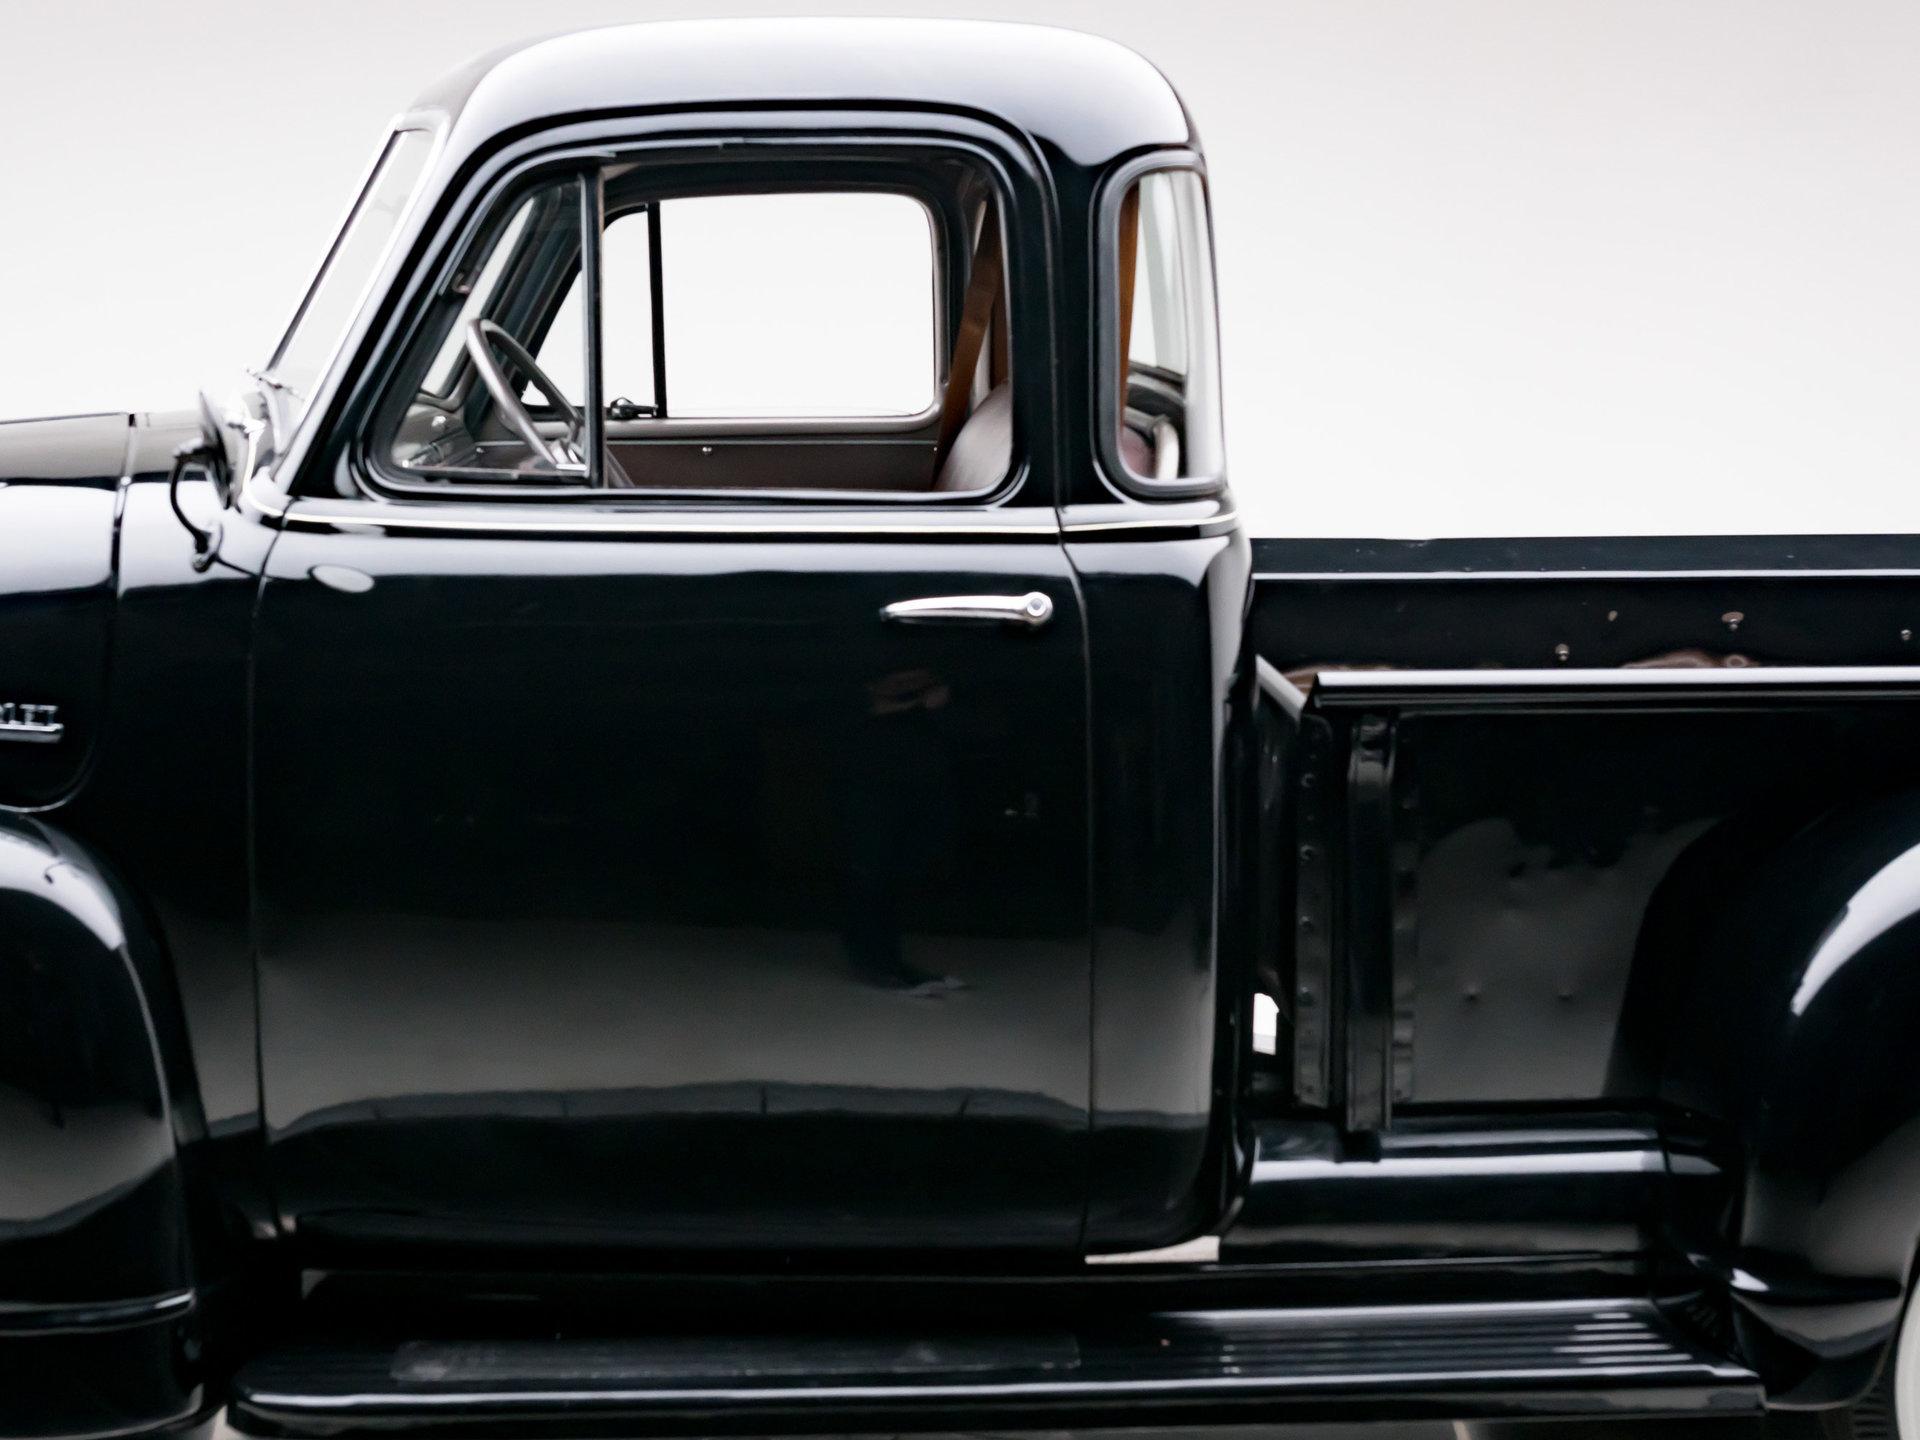 crew truck pickup slt view for hd cab door duramax gmc lifted sale lgw sierra